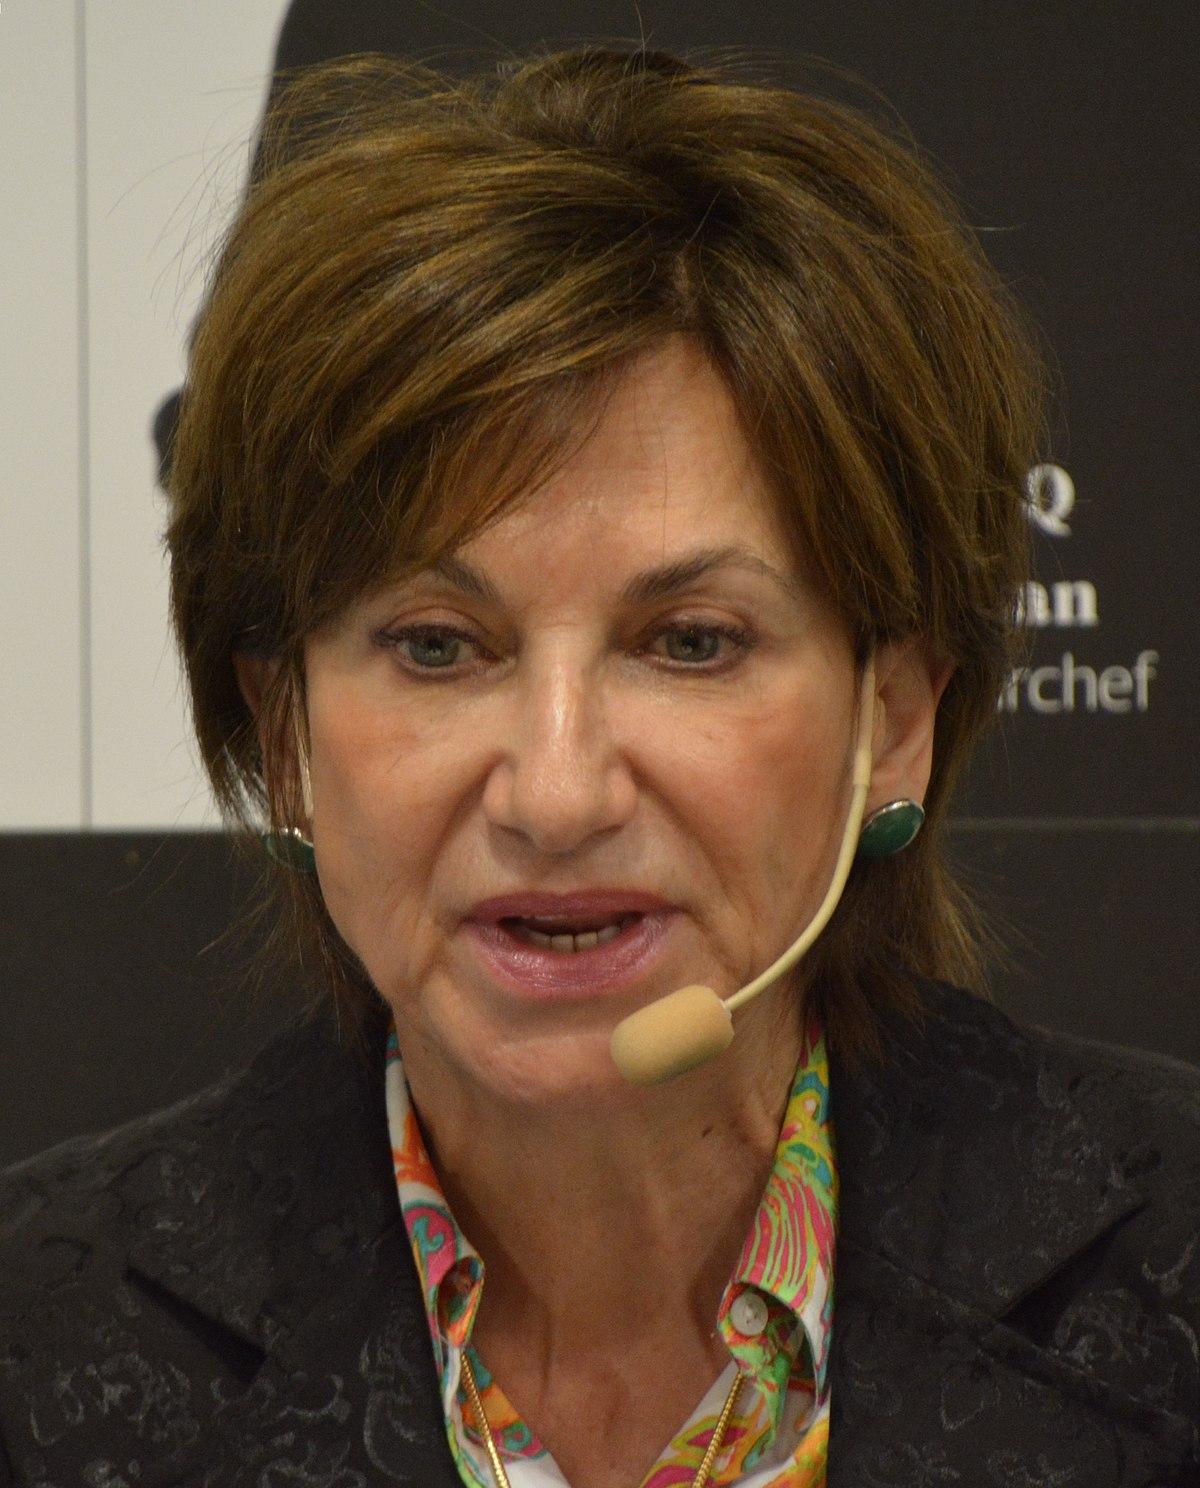 Penanggulangan Anti Pencucian Menurut Lorreta Napoleoni